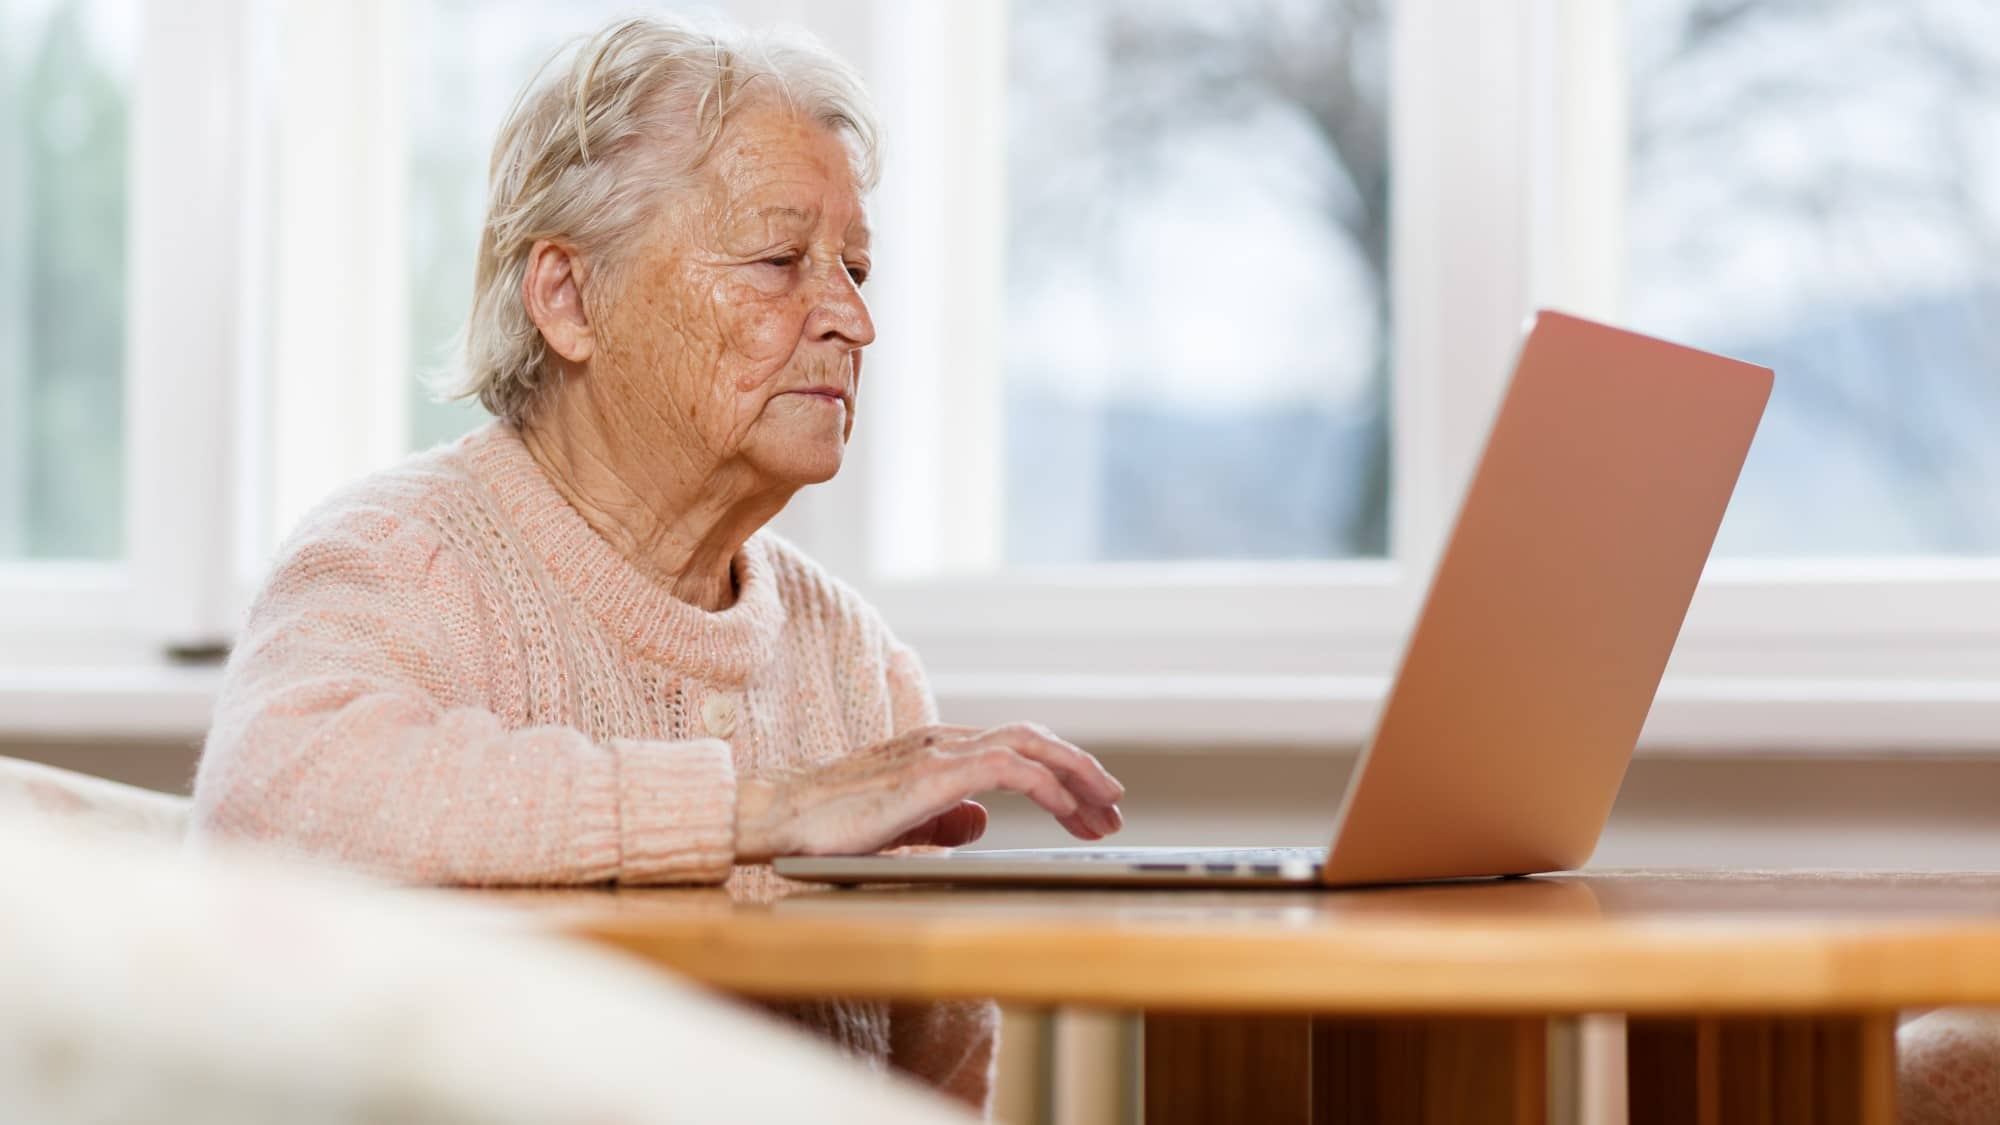 Digital technologies for lifelong learning